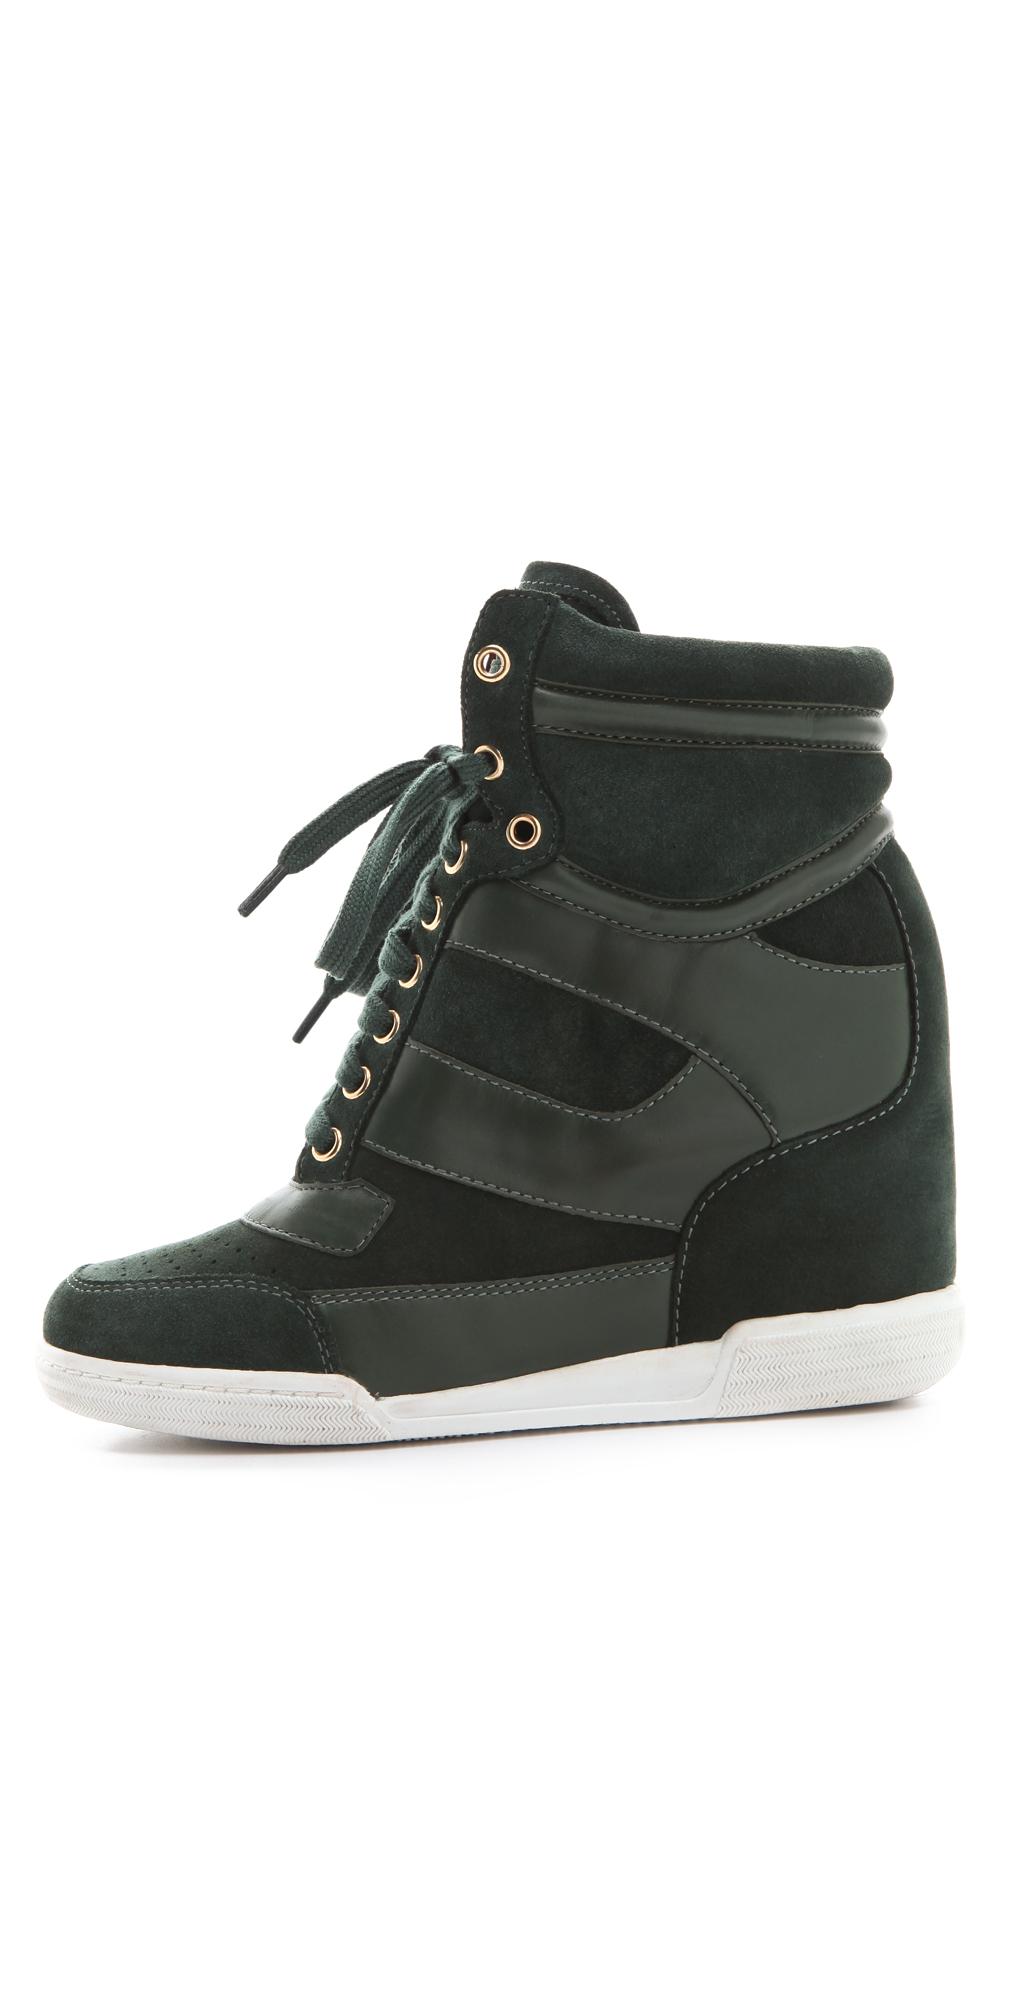 Cailin Hidden Wedge Sneakers cROW2i